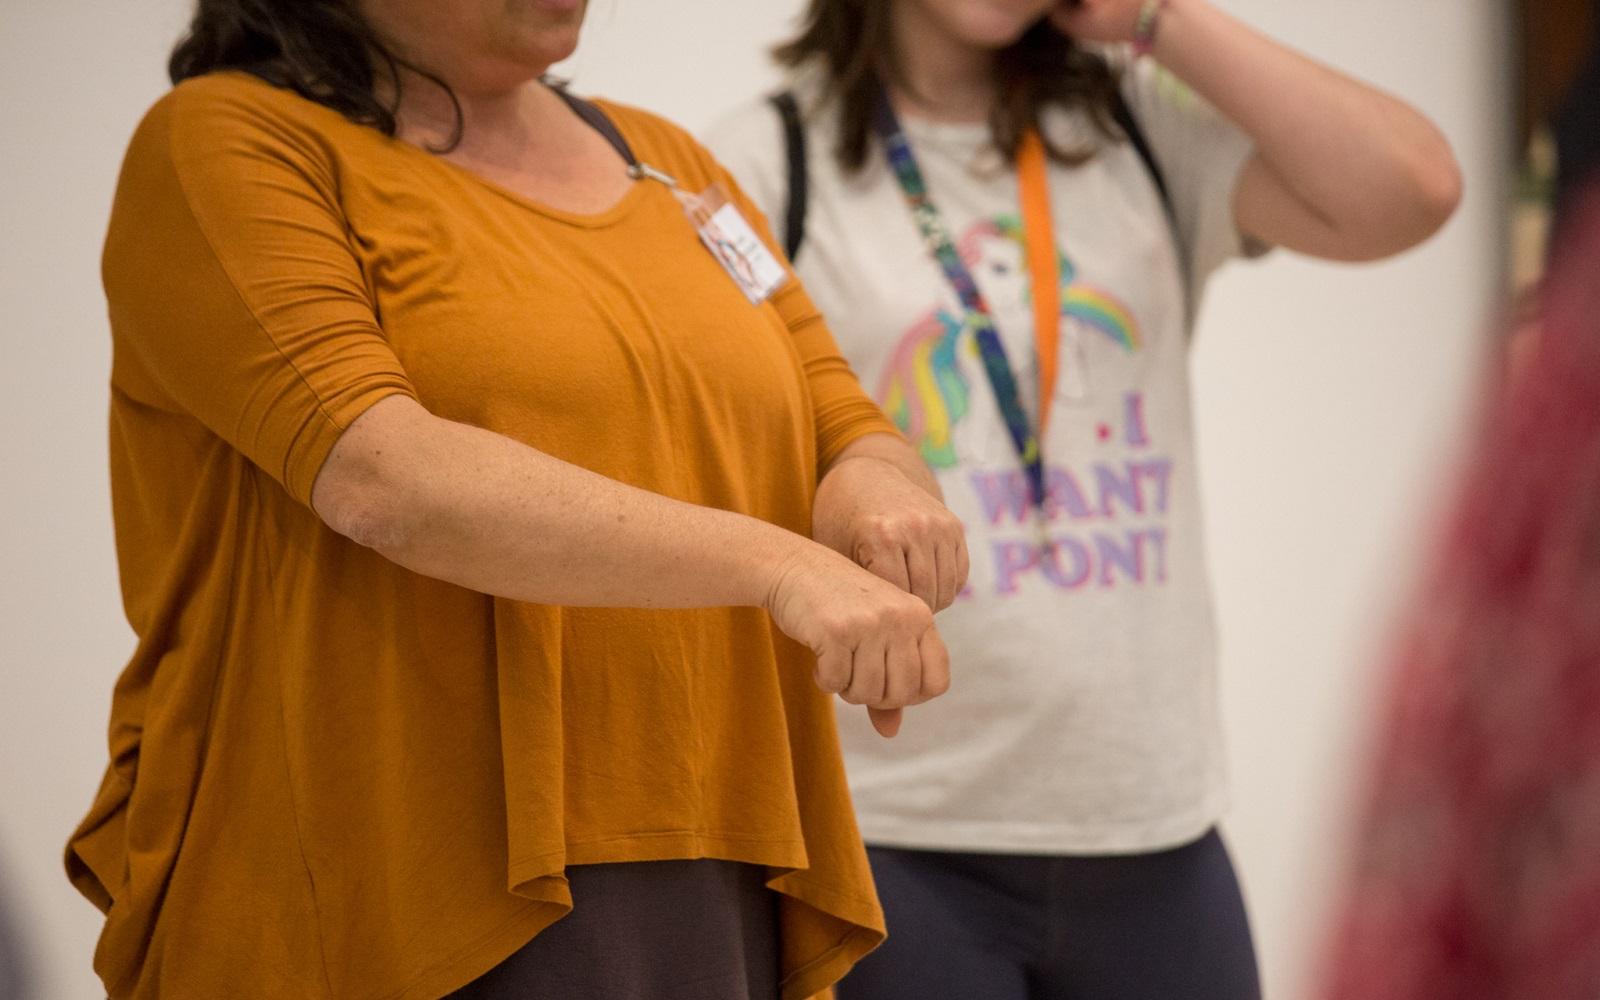 Dança de gestos mínimos